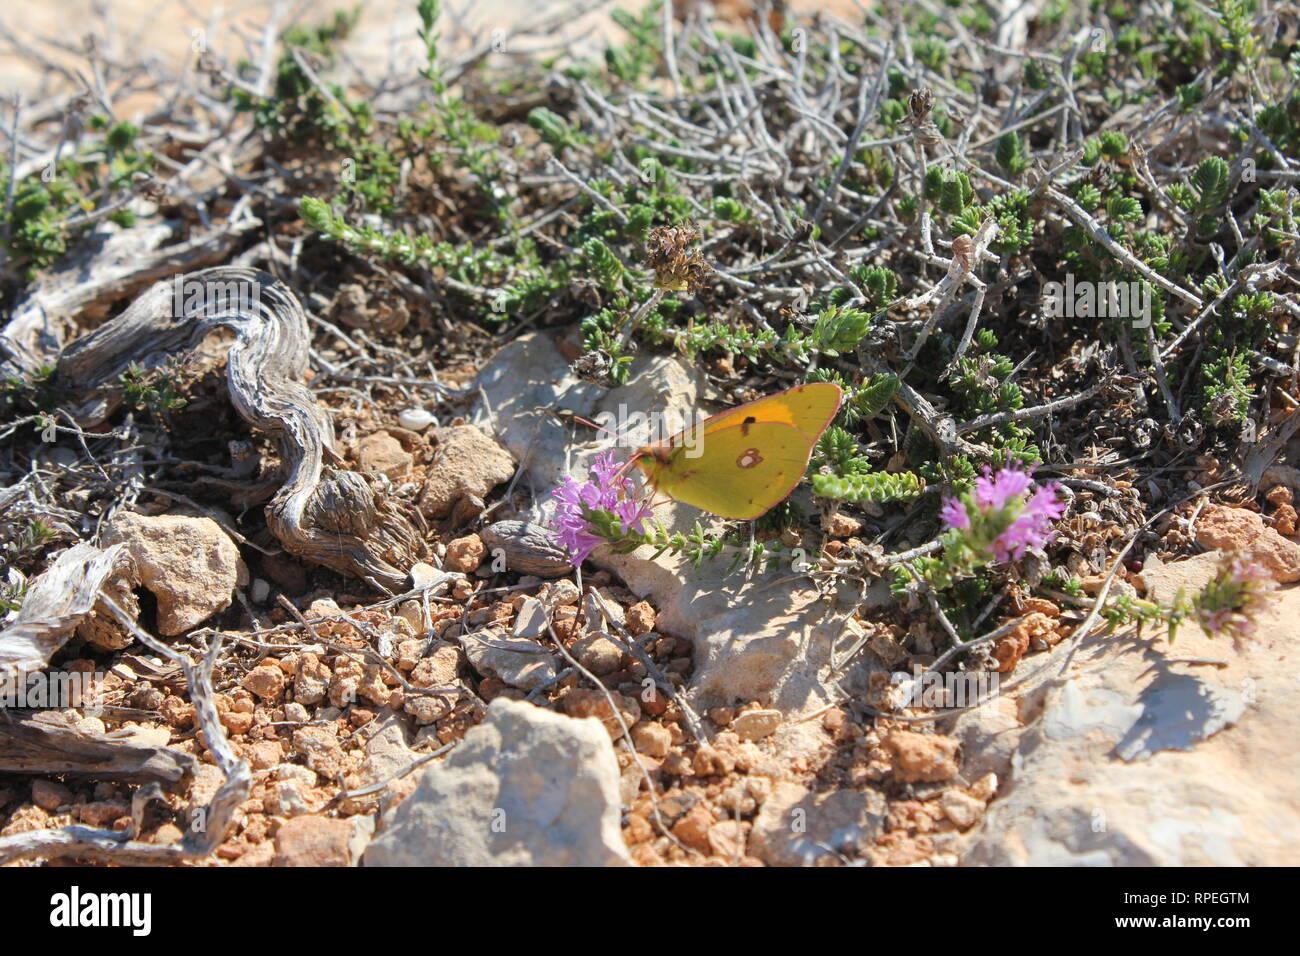 Amarillo (Colias croceus nublado), Marfa, Malta Foto de stock